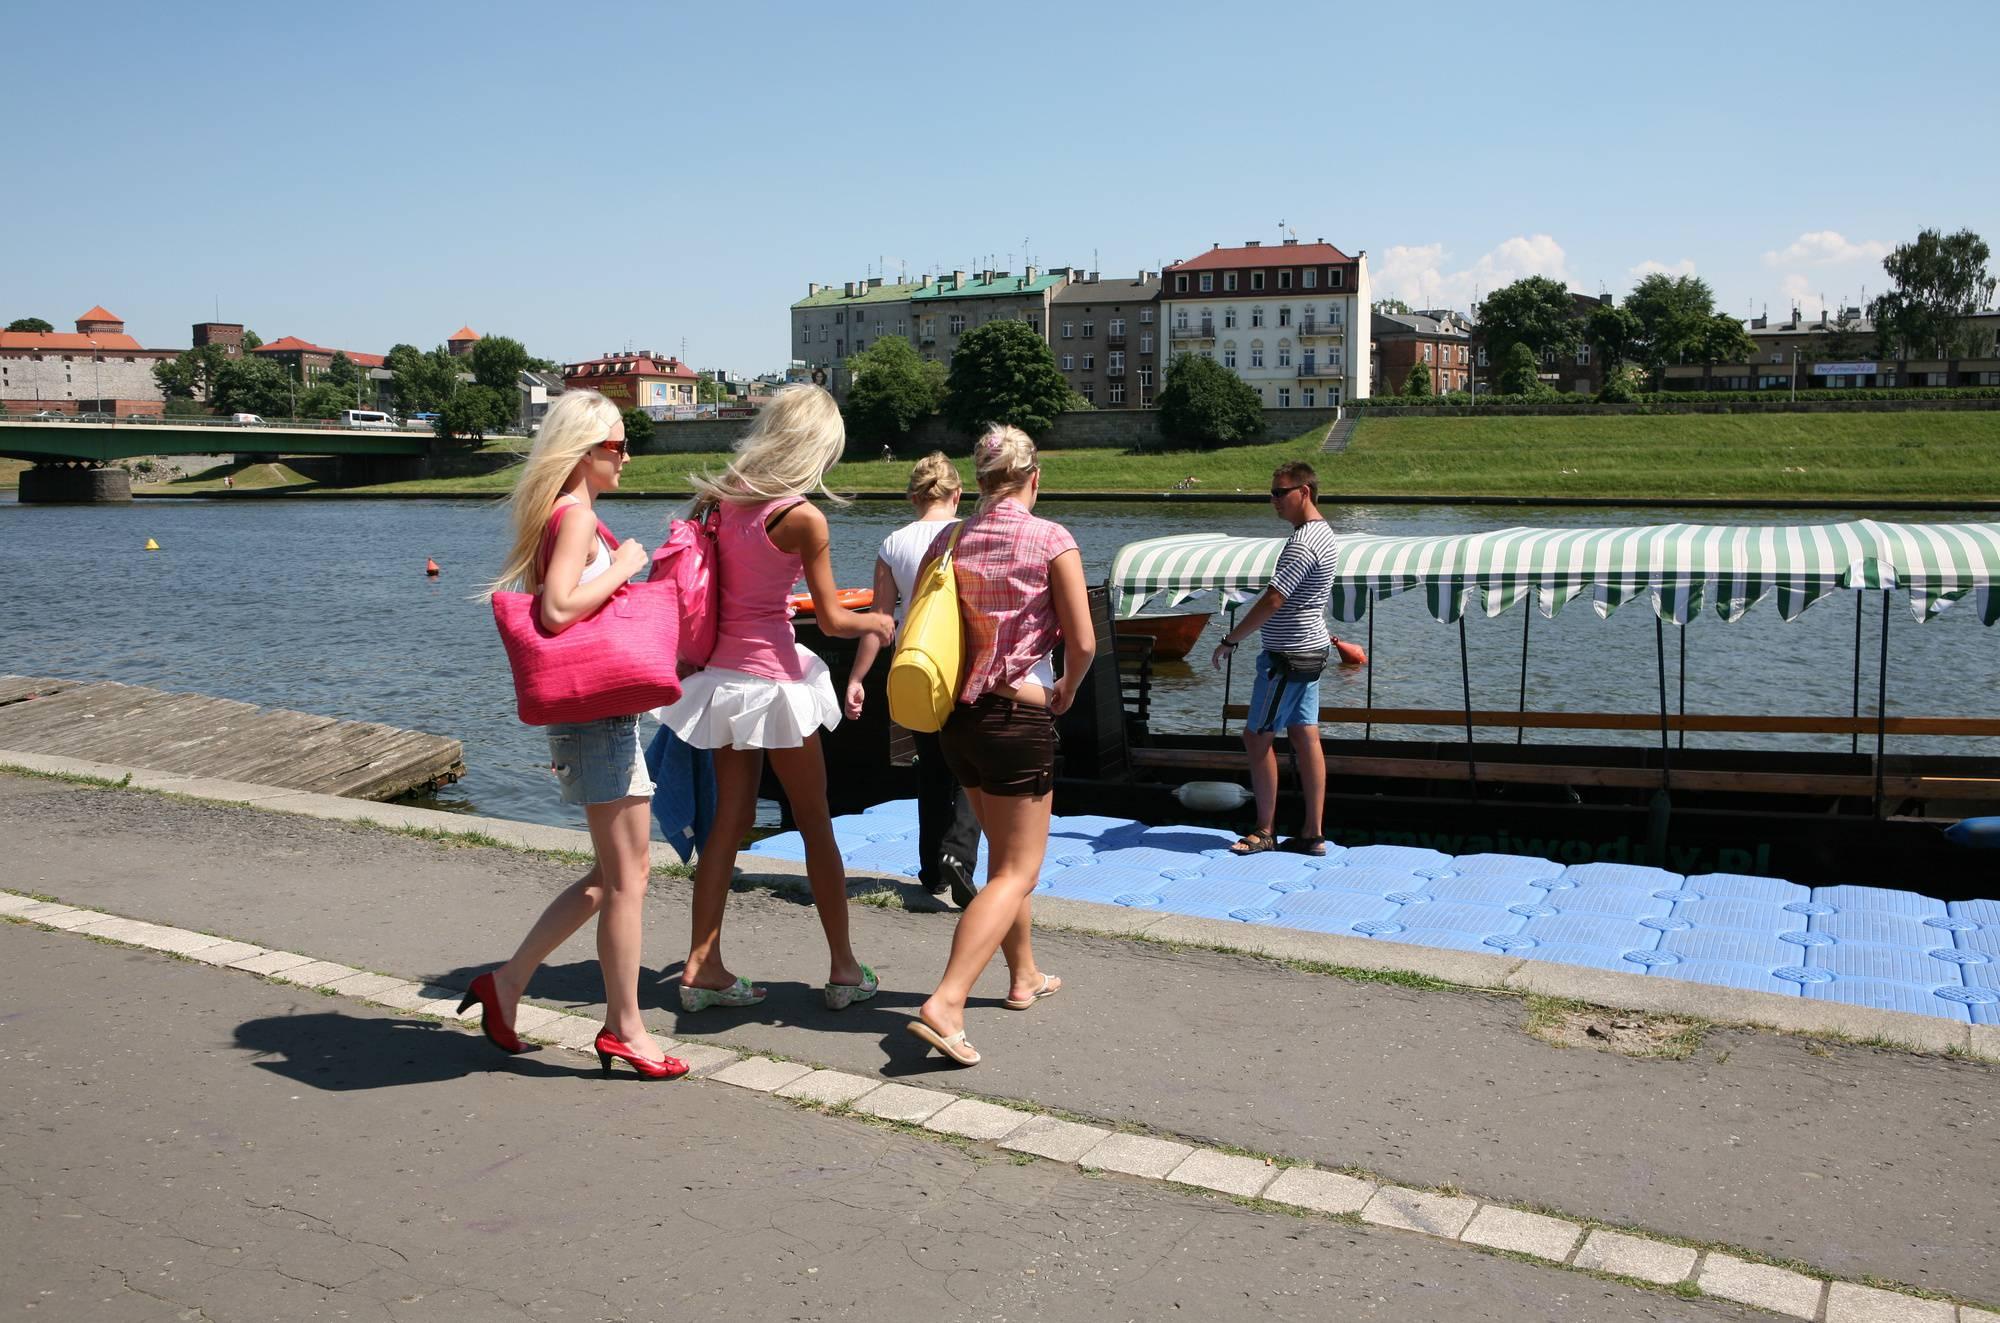 River Boat Preparations - 4